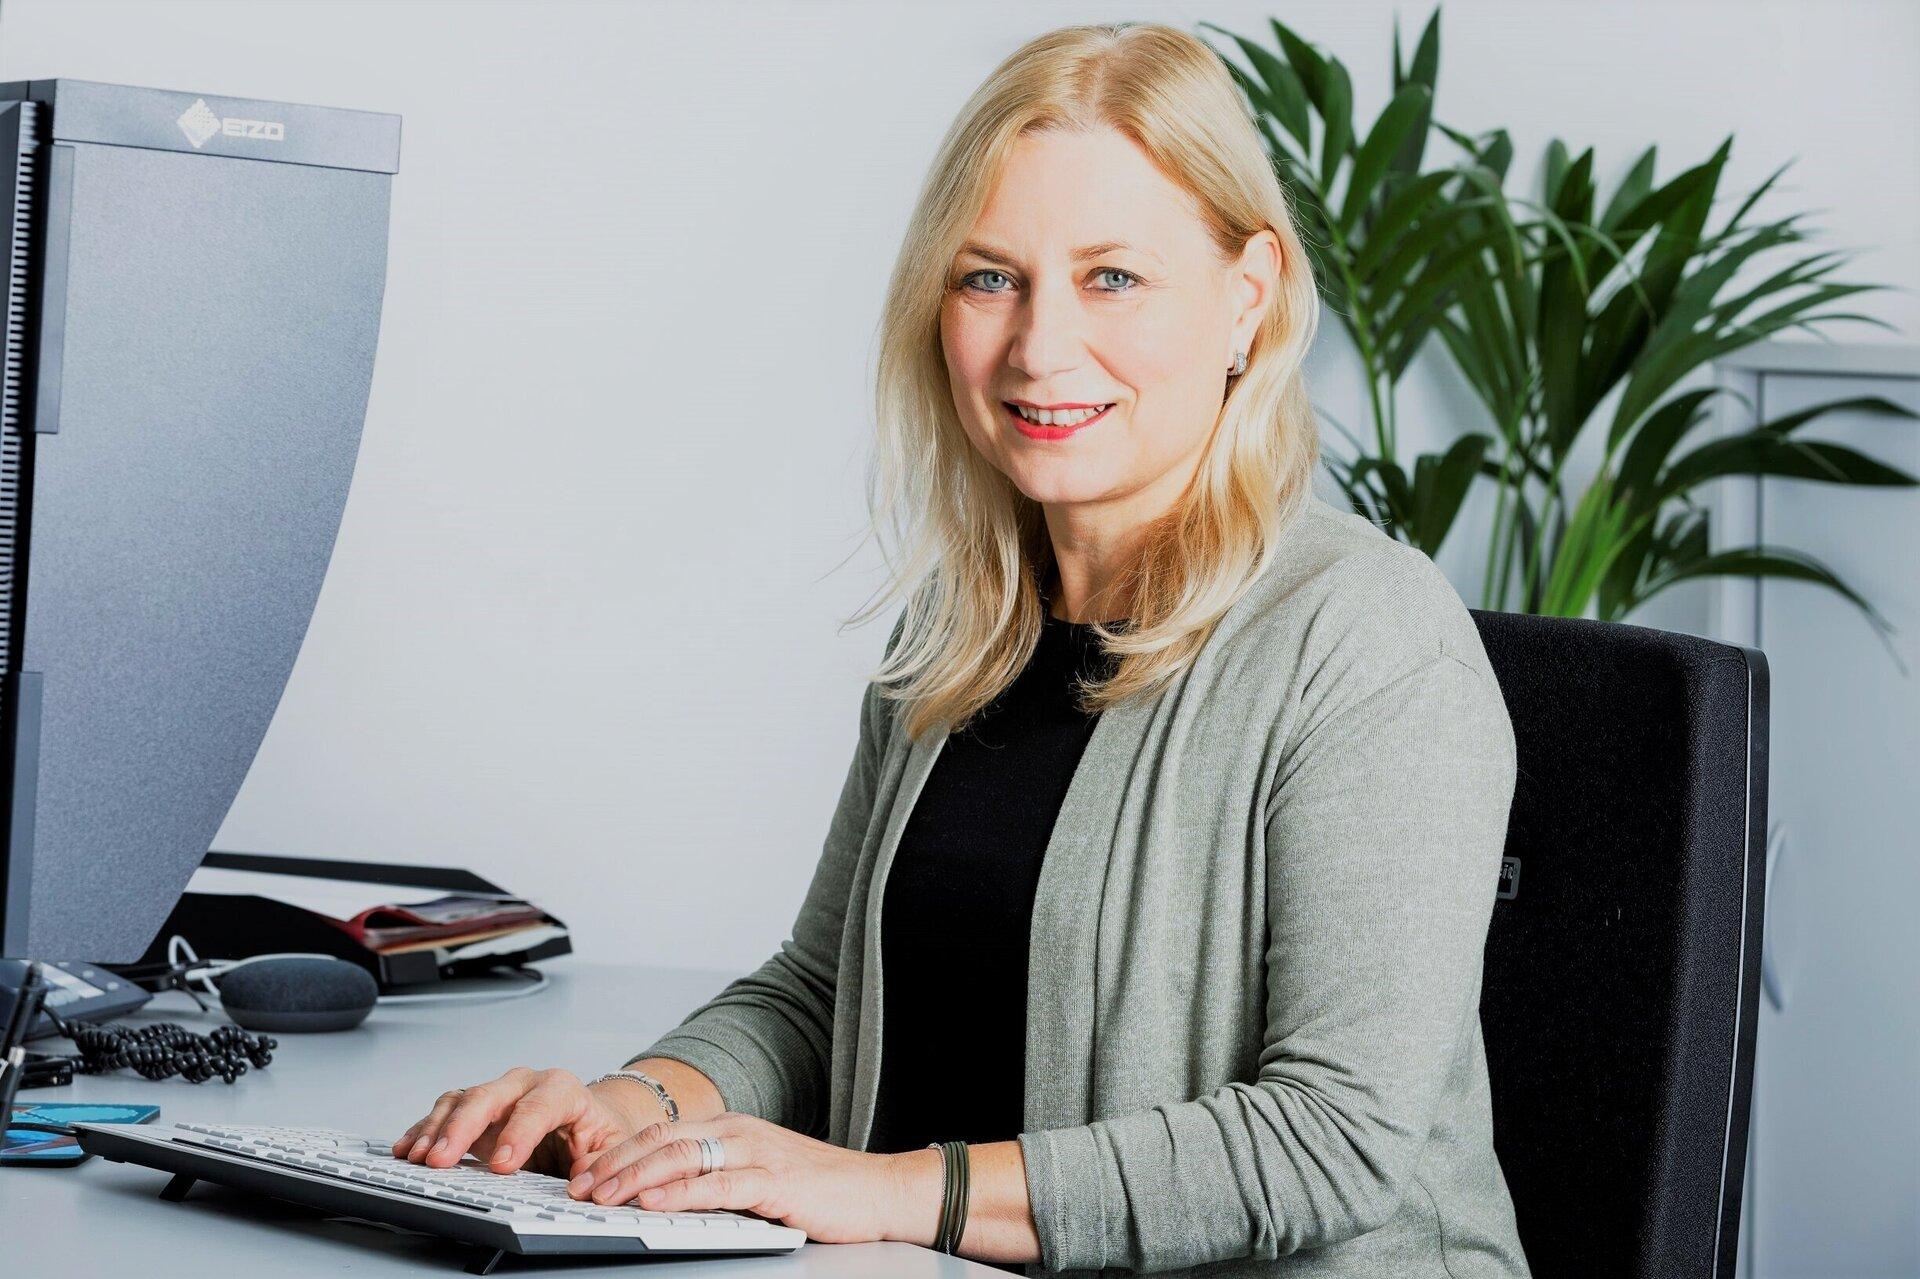 Sonja Keienburg